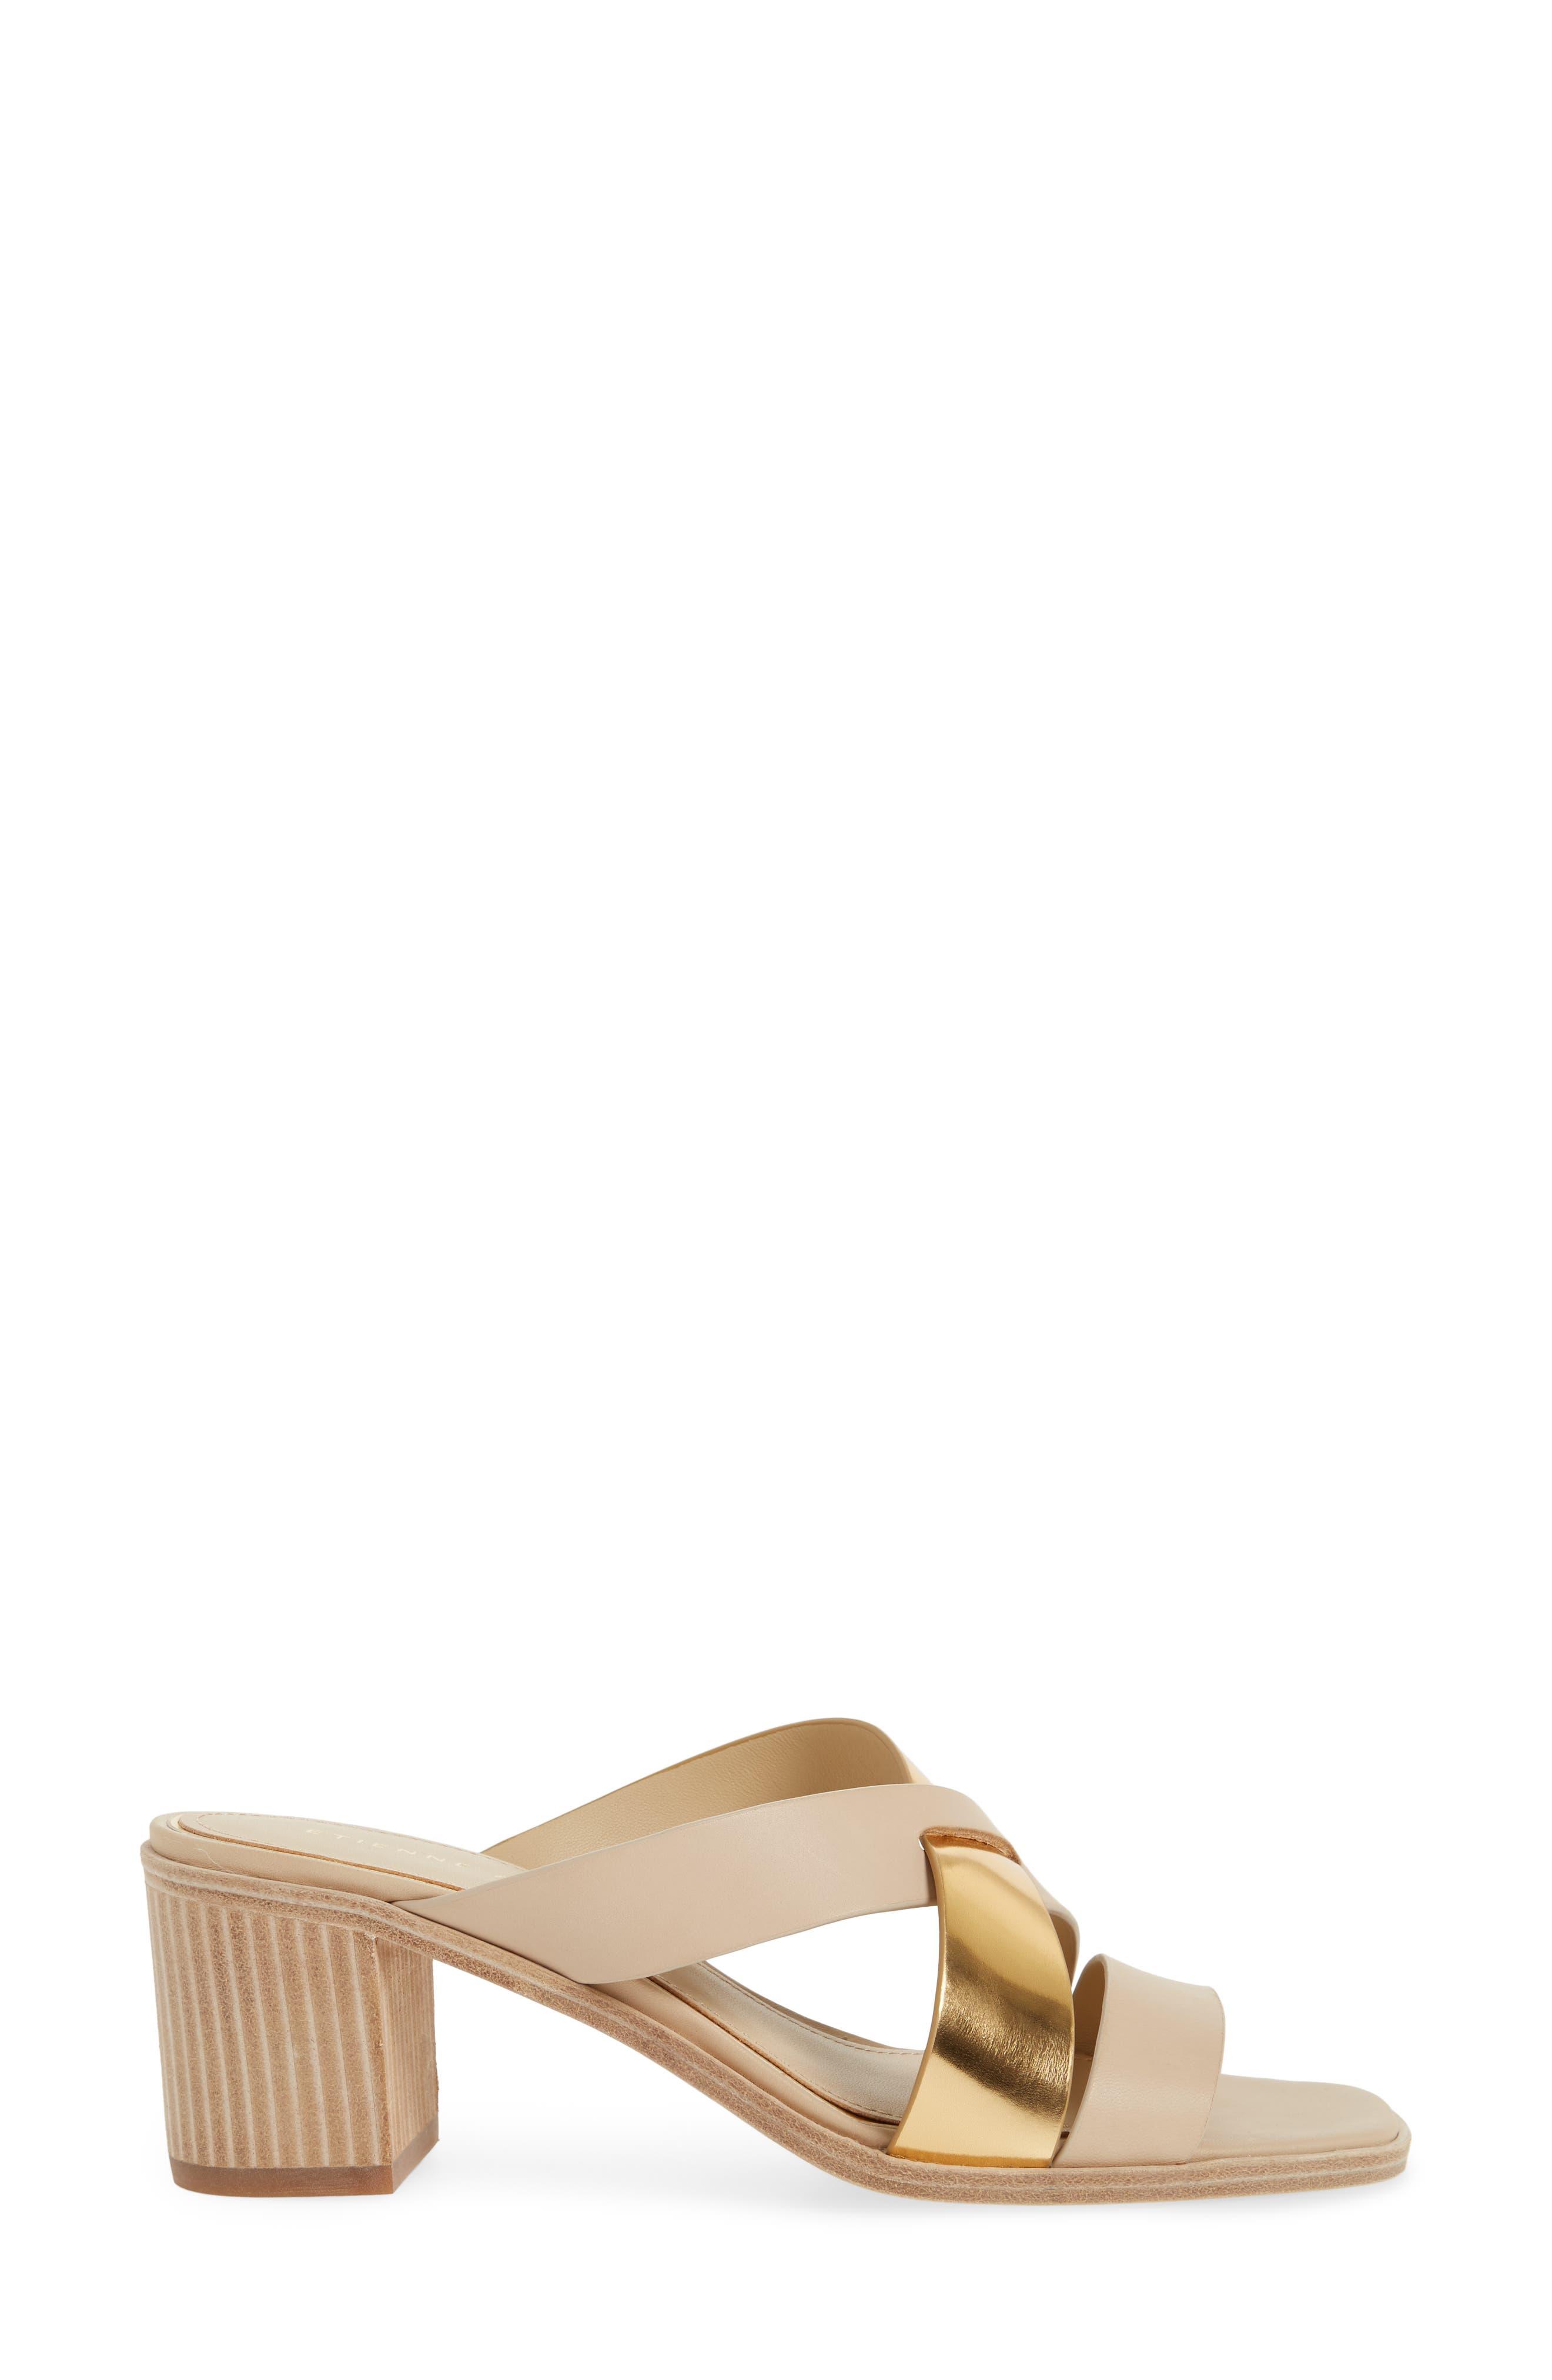 Negroni Cross Strap Mule Sandal,                             Alternate thumbnail 3, color,                             Natural/ Gold Leather